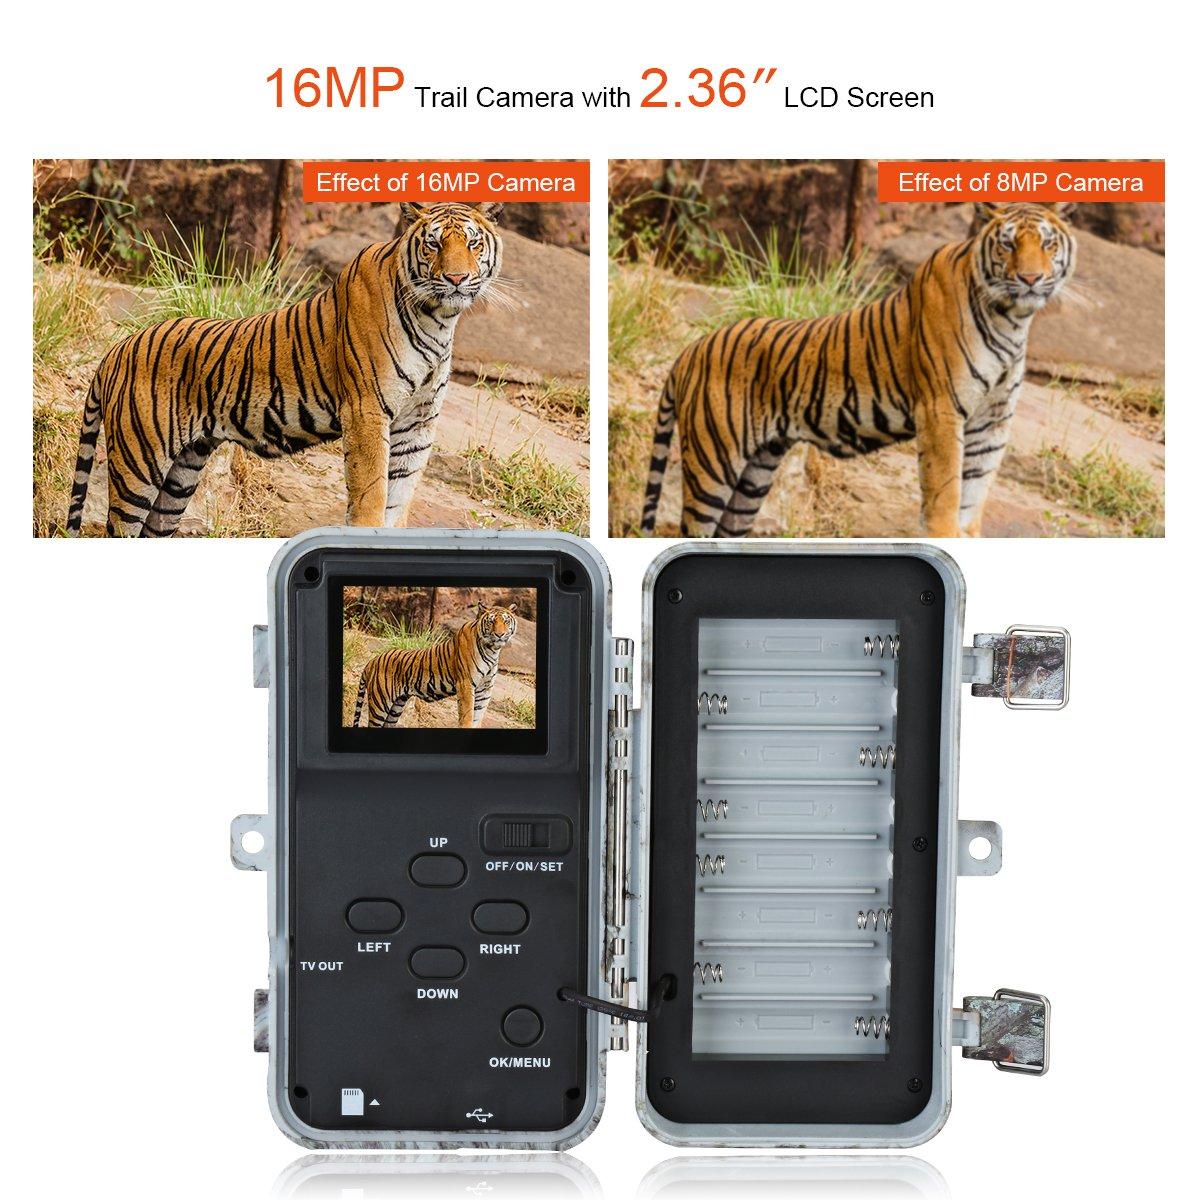 amazon com blazevideo 16mp hd trail hunting wildlife camera